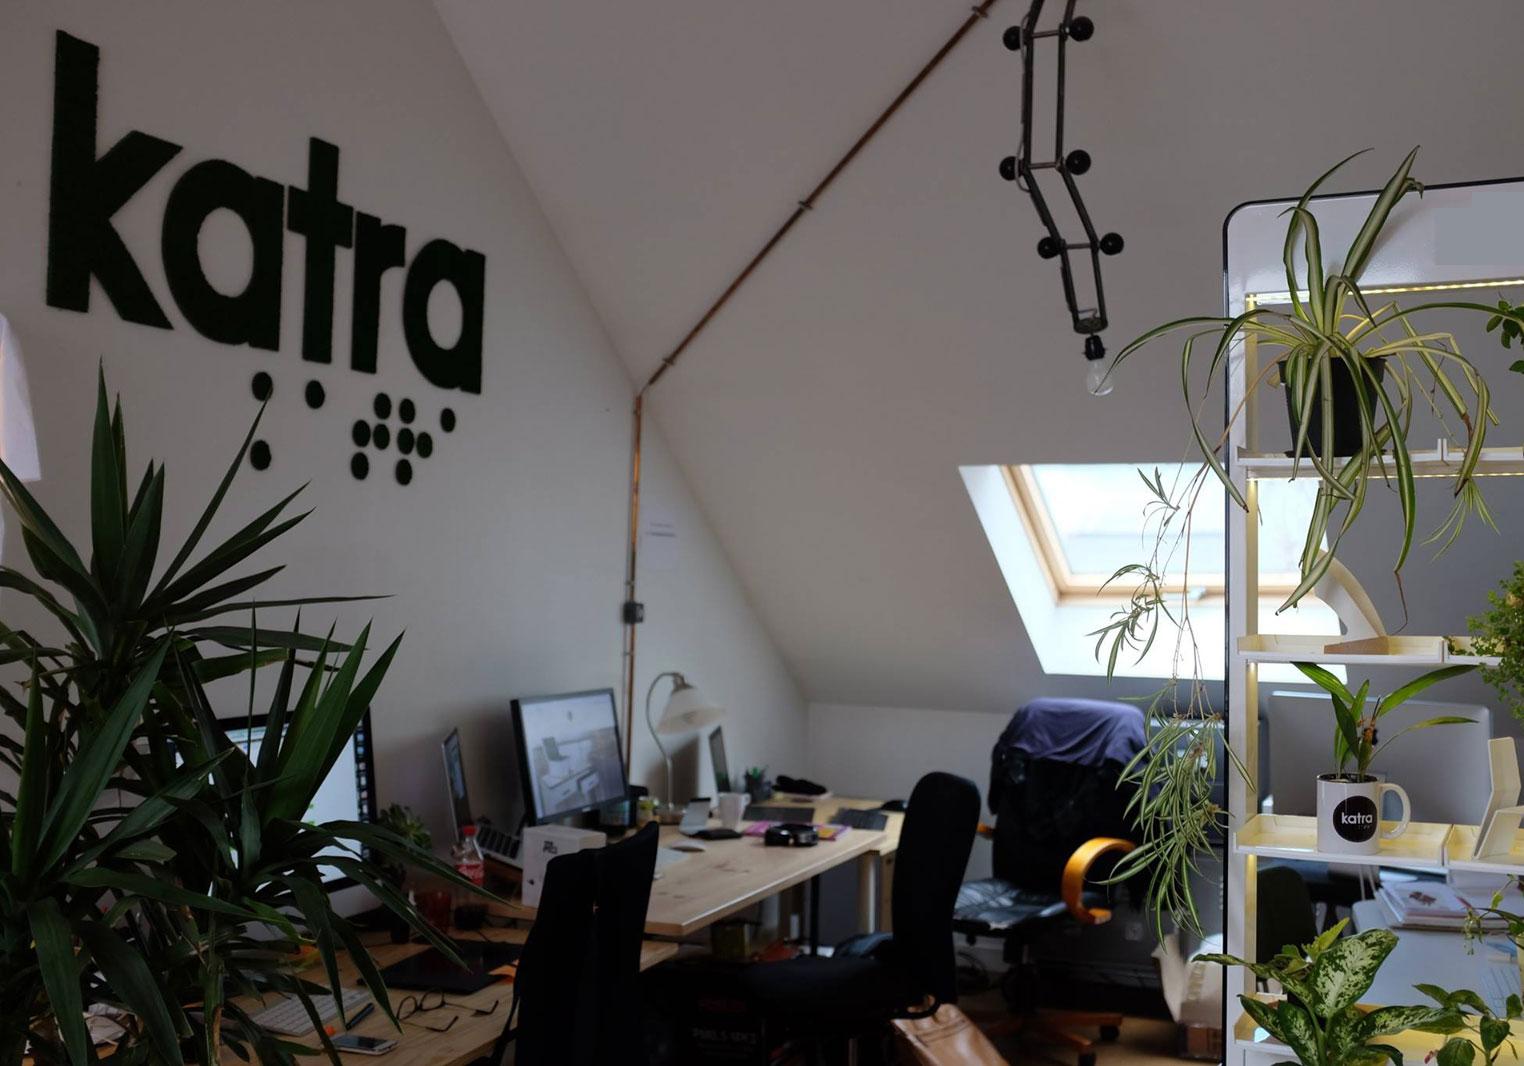 studio-katra-bureau